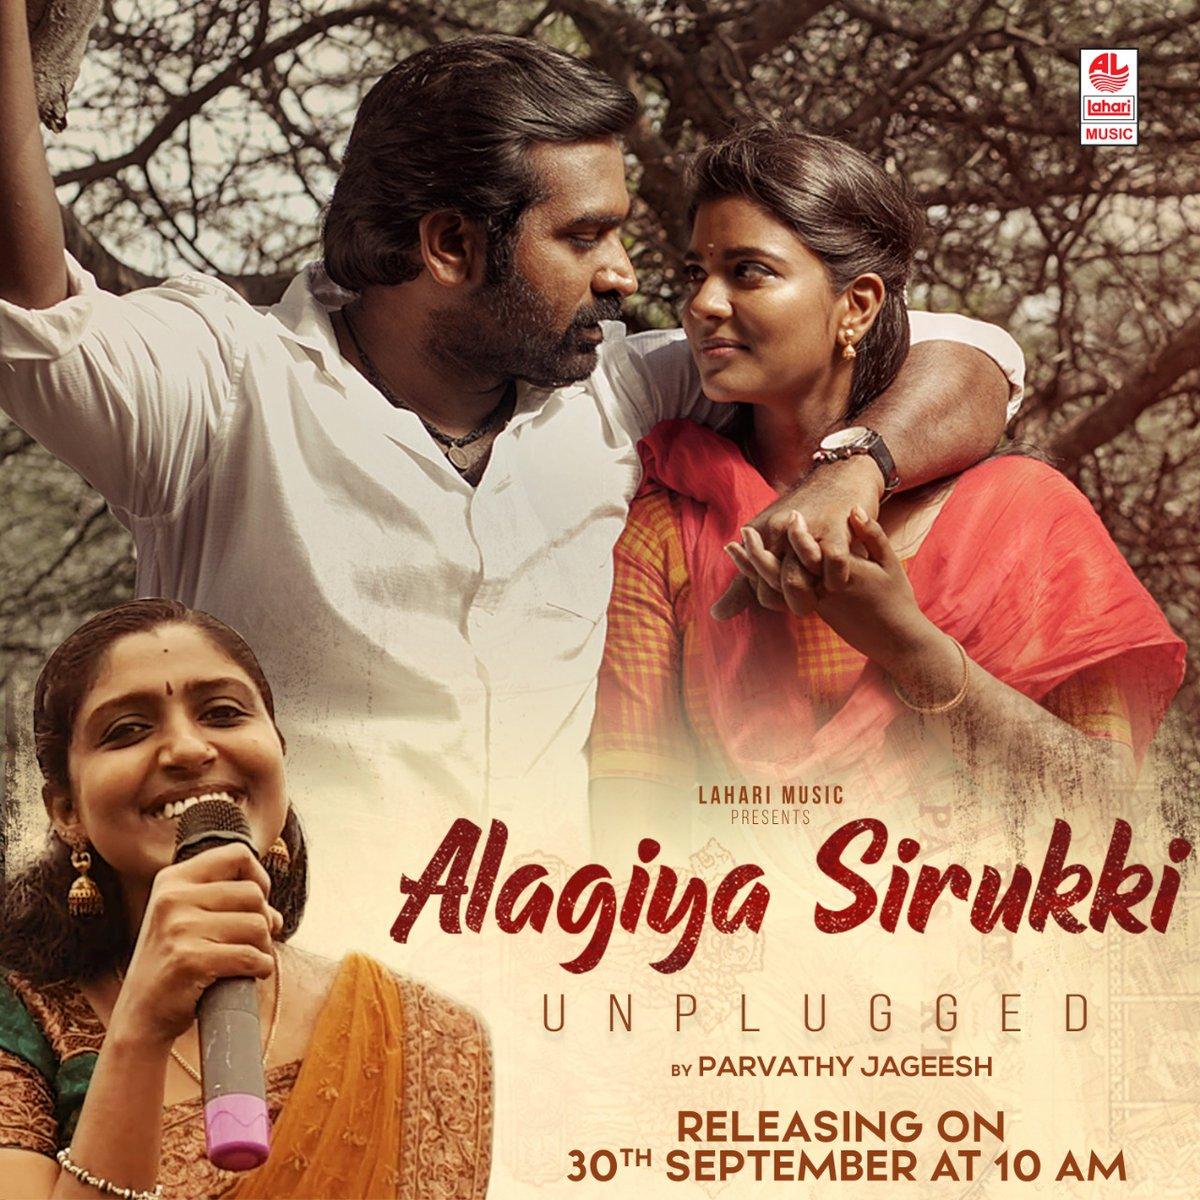 #LahariMusic presents #AlagiyaSirukki unplugged by #ParvathyJageesh releasing on September 30th at 10 AM...